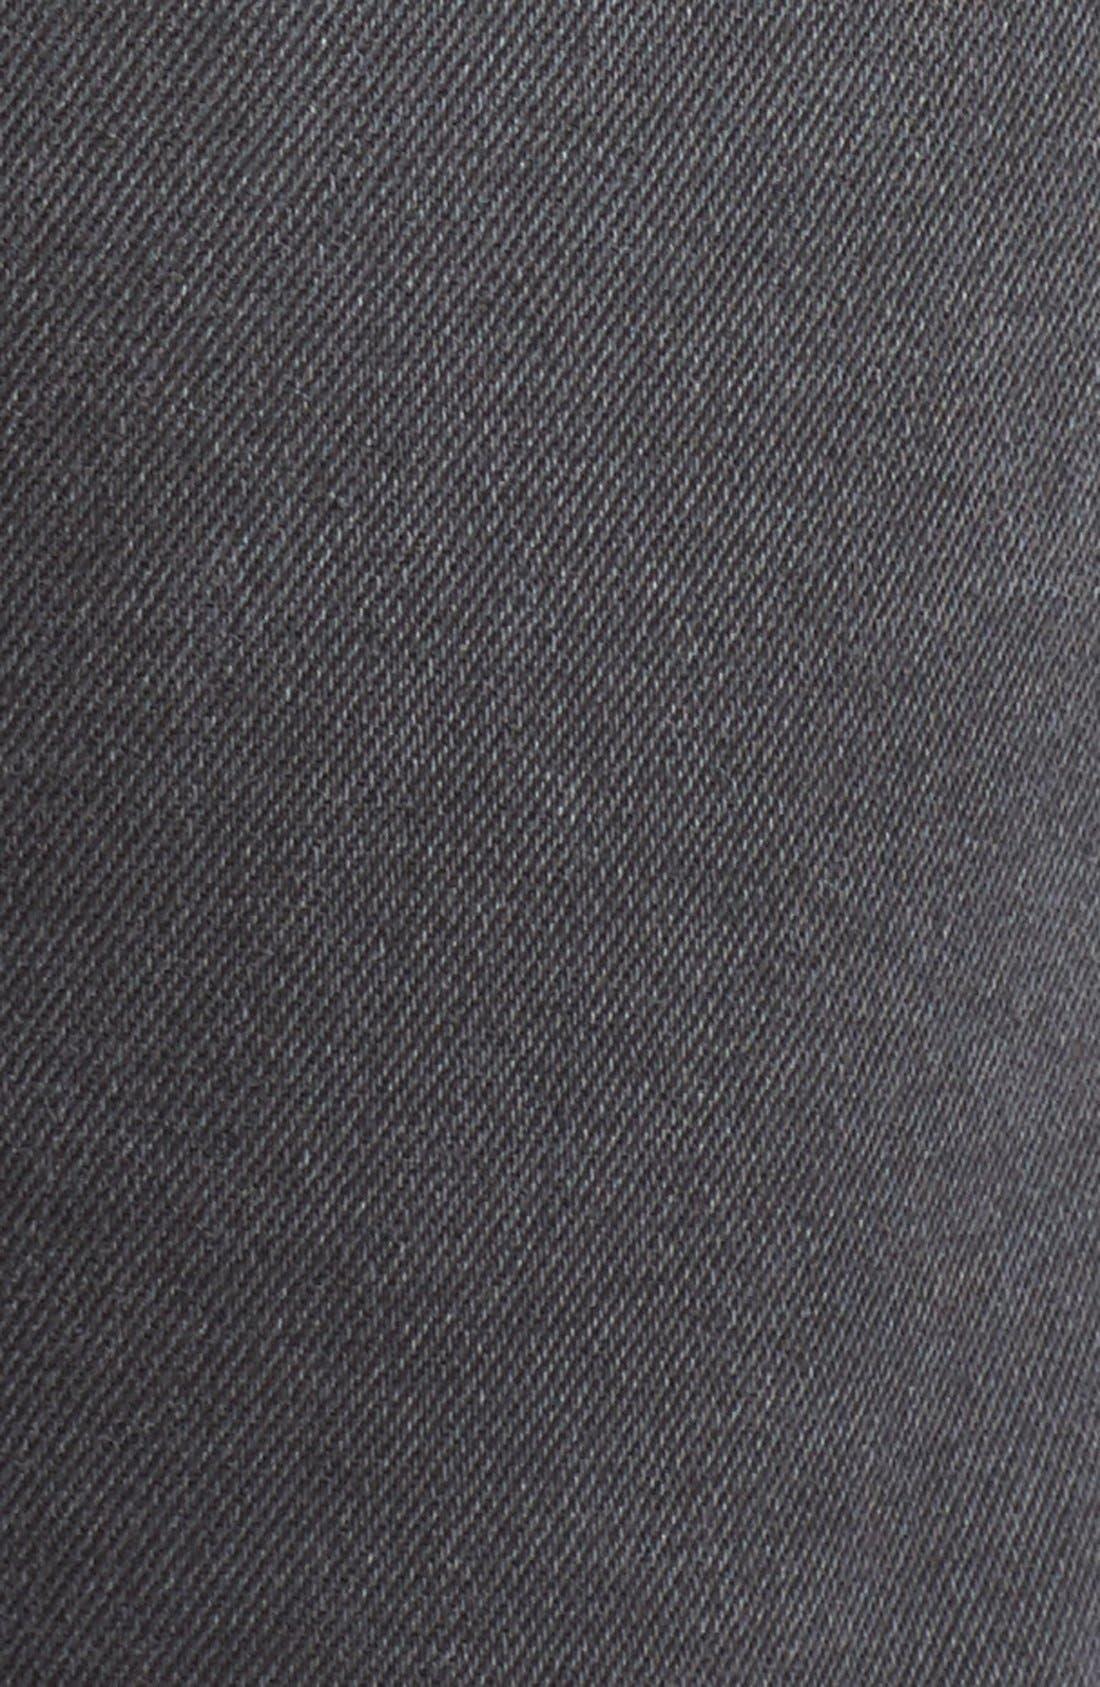 Eastham Slim Fit Stretch Denim Moto Jeans,                             Alternate thumbnail 7, color,                             022